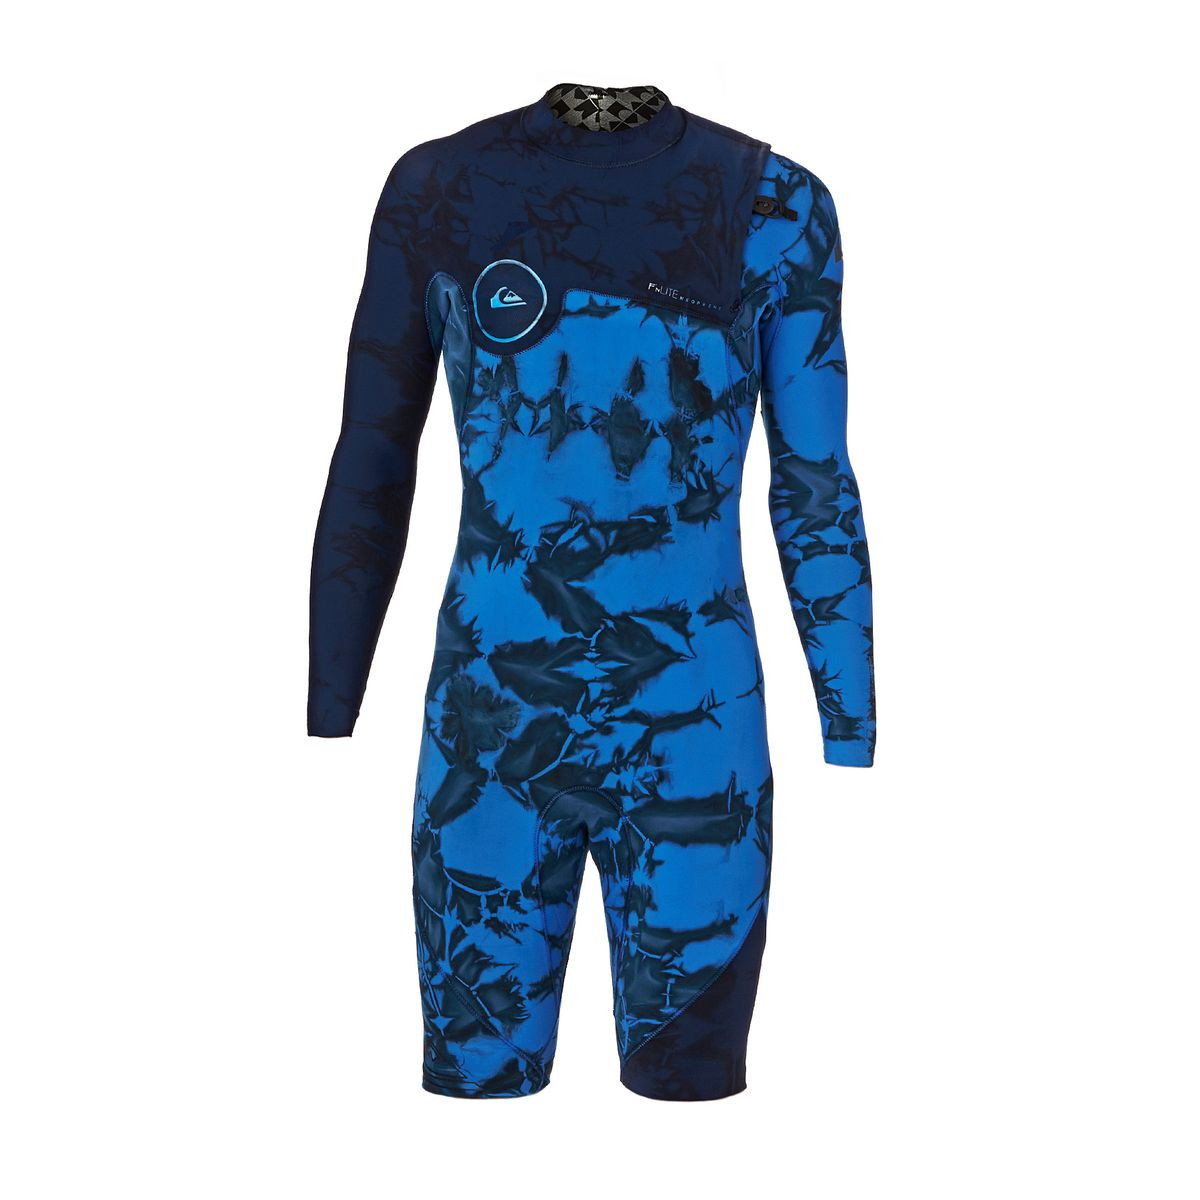 Quiksilver Highline Dye Capsule 2mm 2017 Long Sleeve Zipperless Wetsuit - Navy Blazer